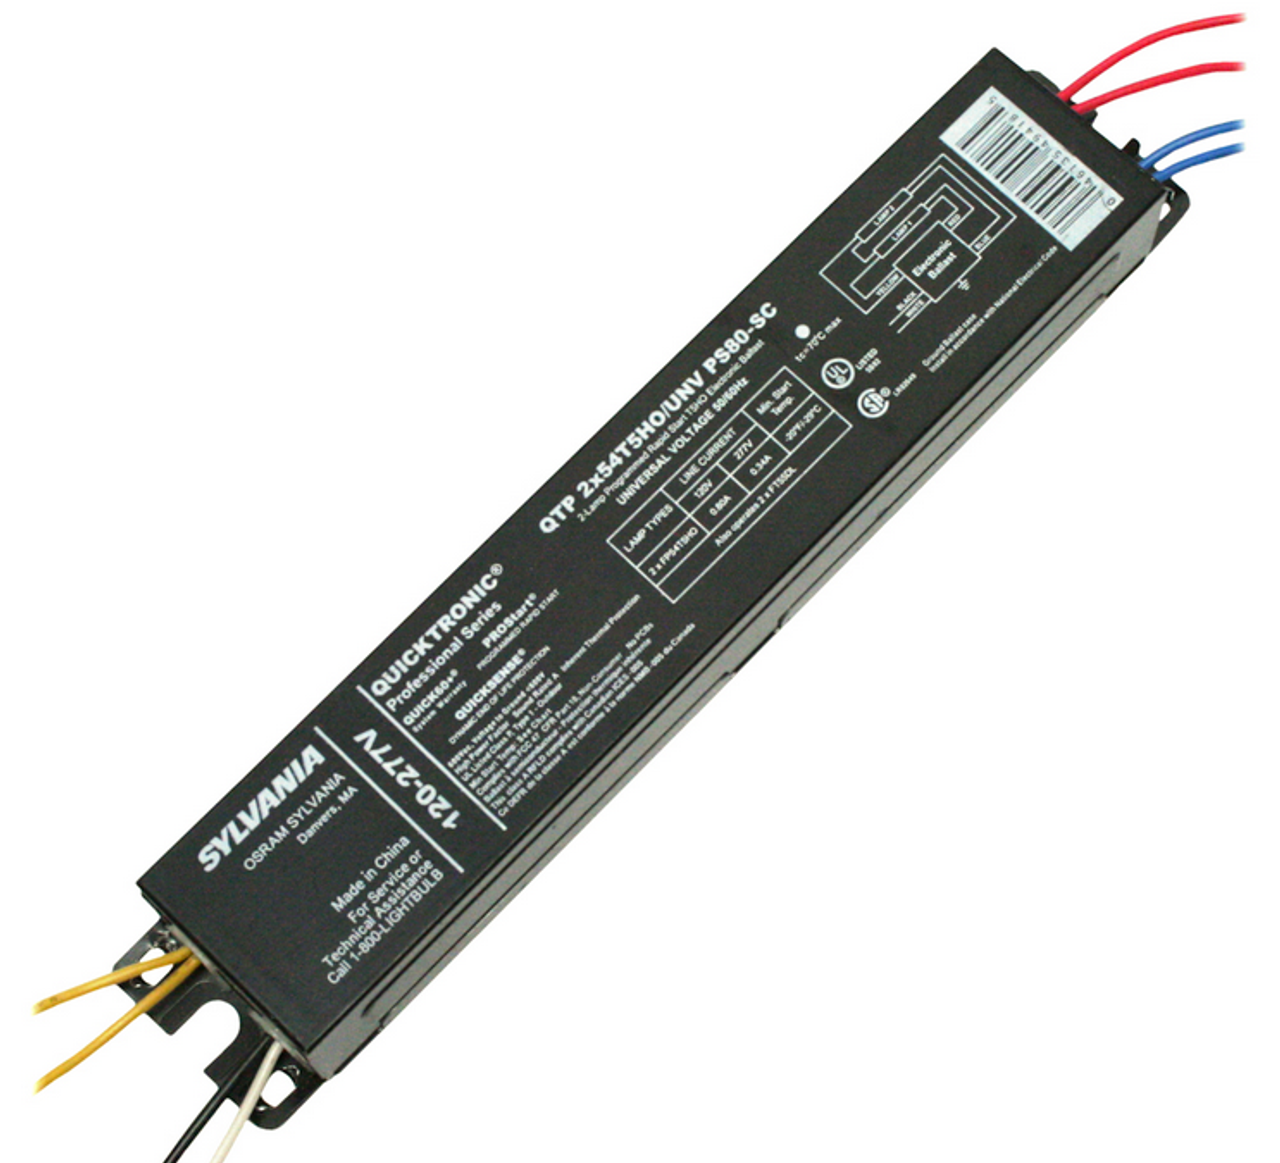 T5ho Ballast Wiring Diagram - Wiring Diagrams on